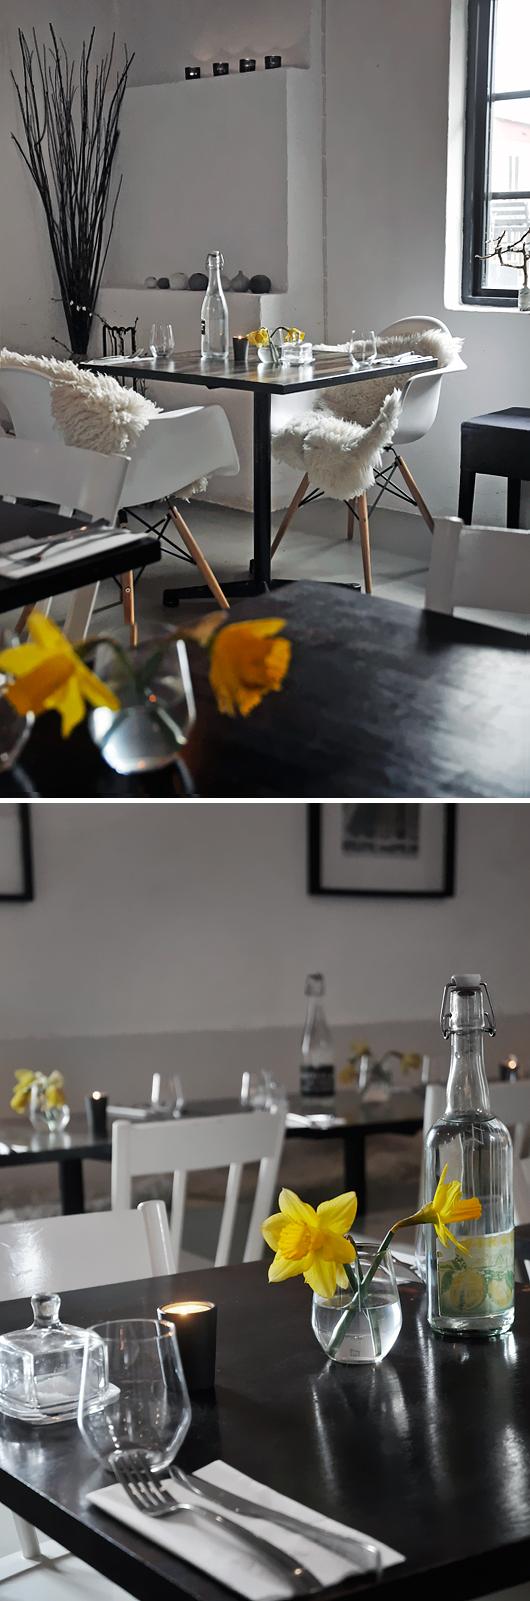 Påskpyntat bord Vindåkra gård Malmö